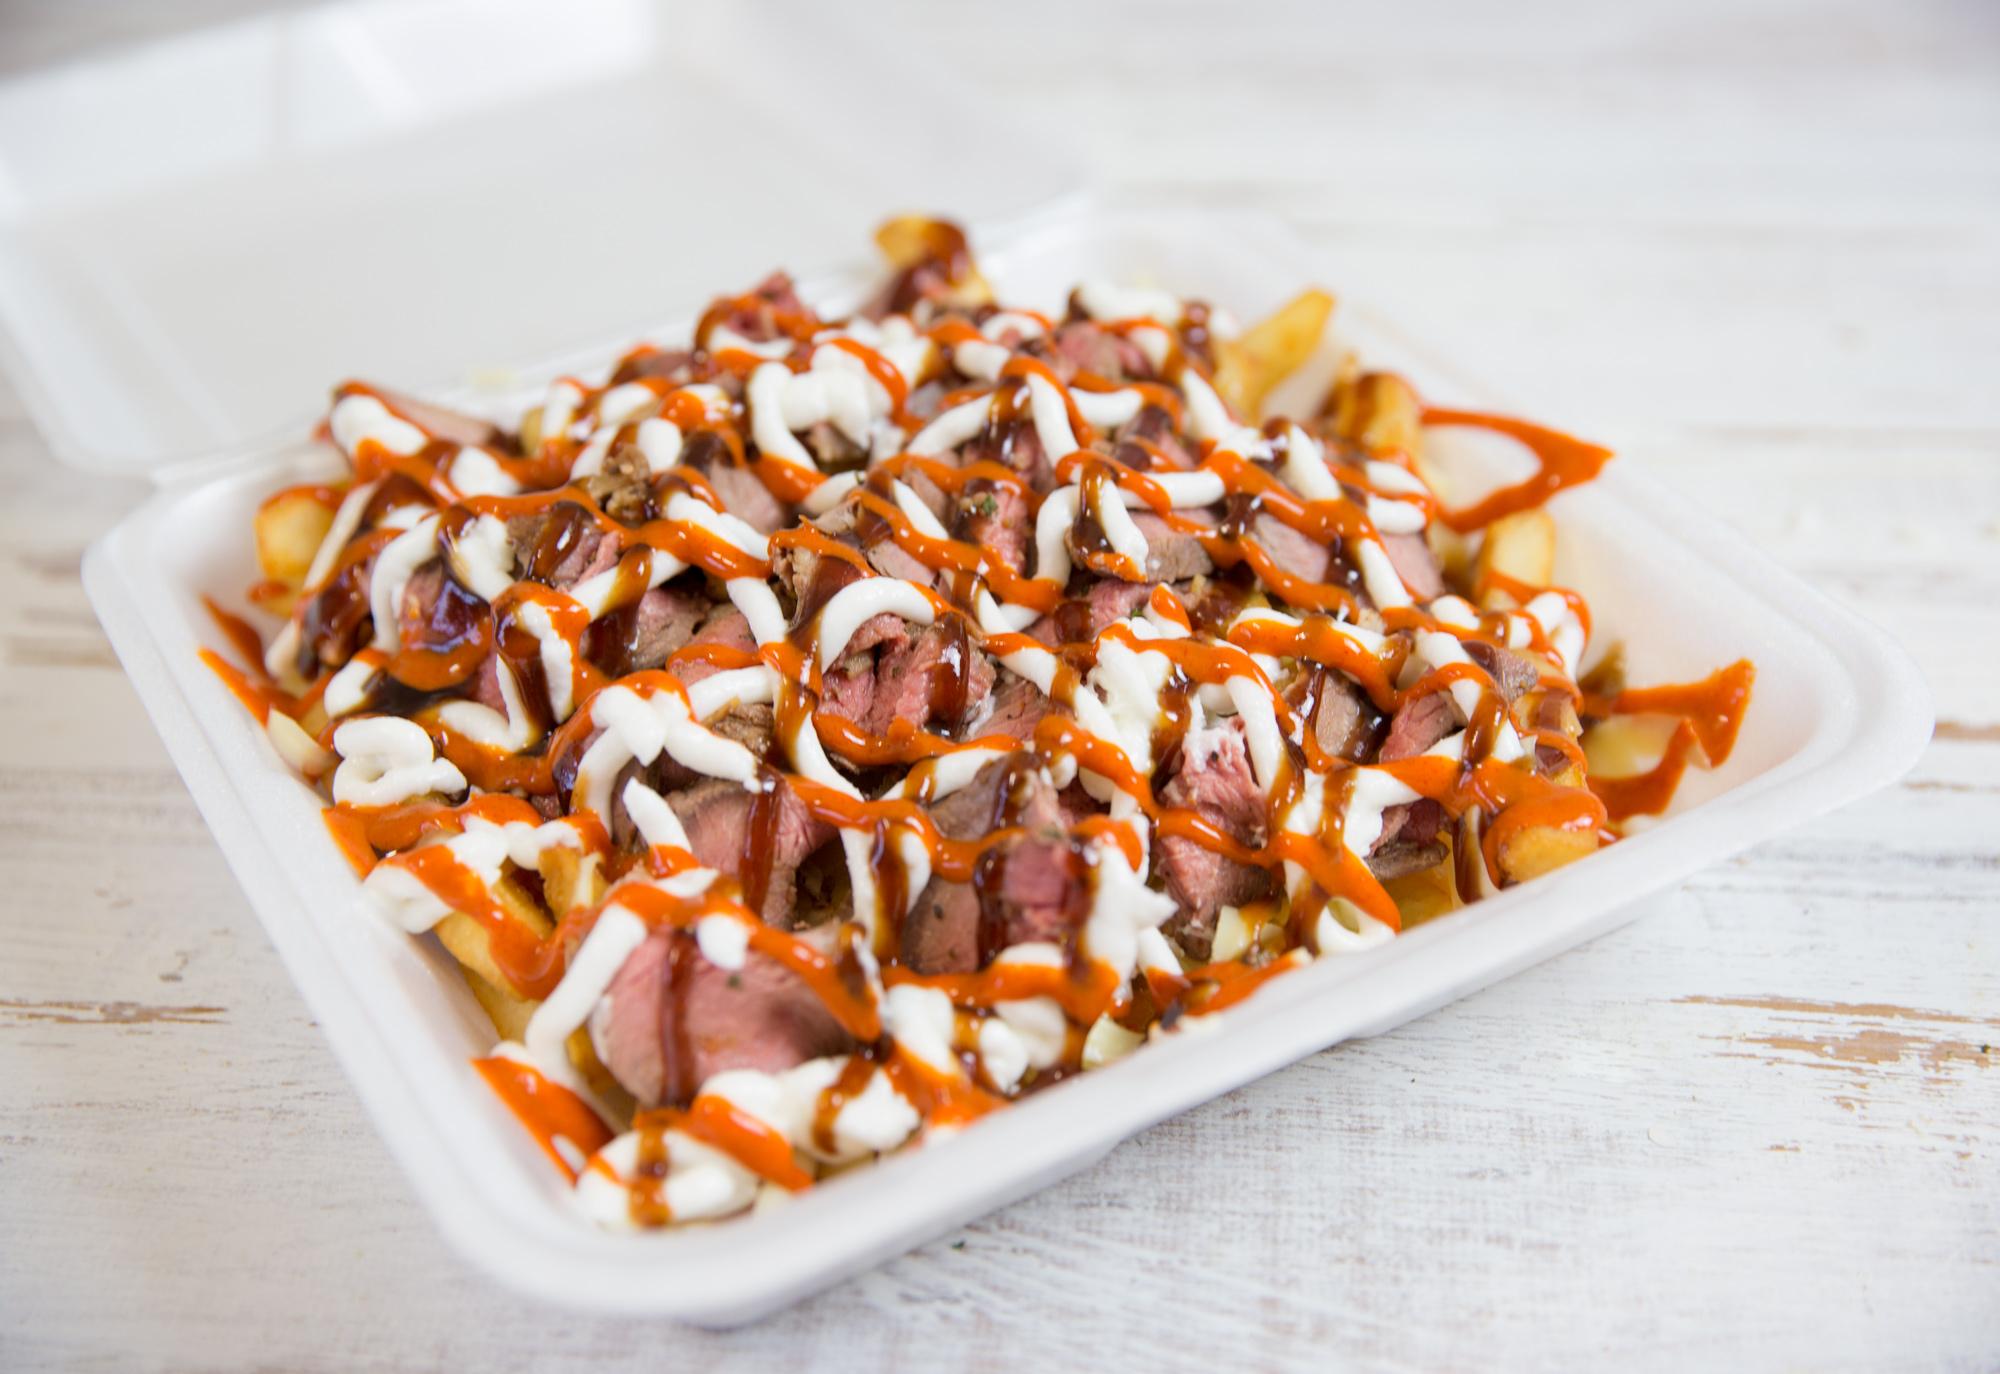 Make a halal snack pack at home tristan lutze food make a halal snack pack at home forumfinder Images